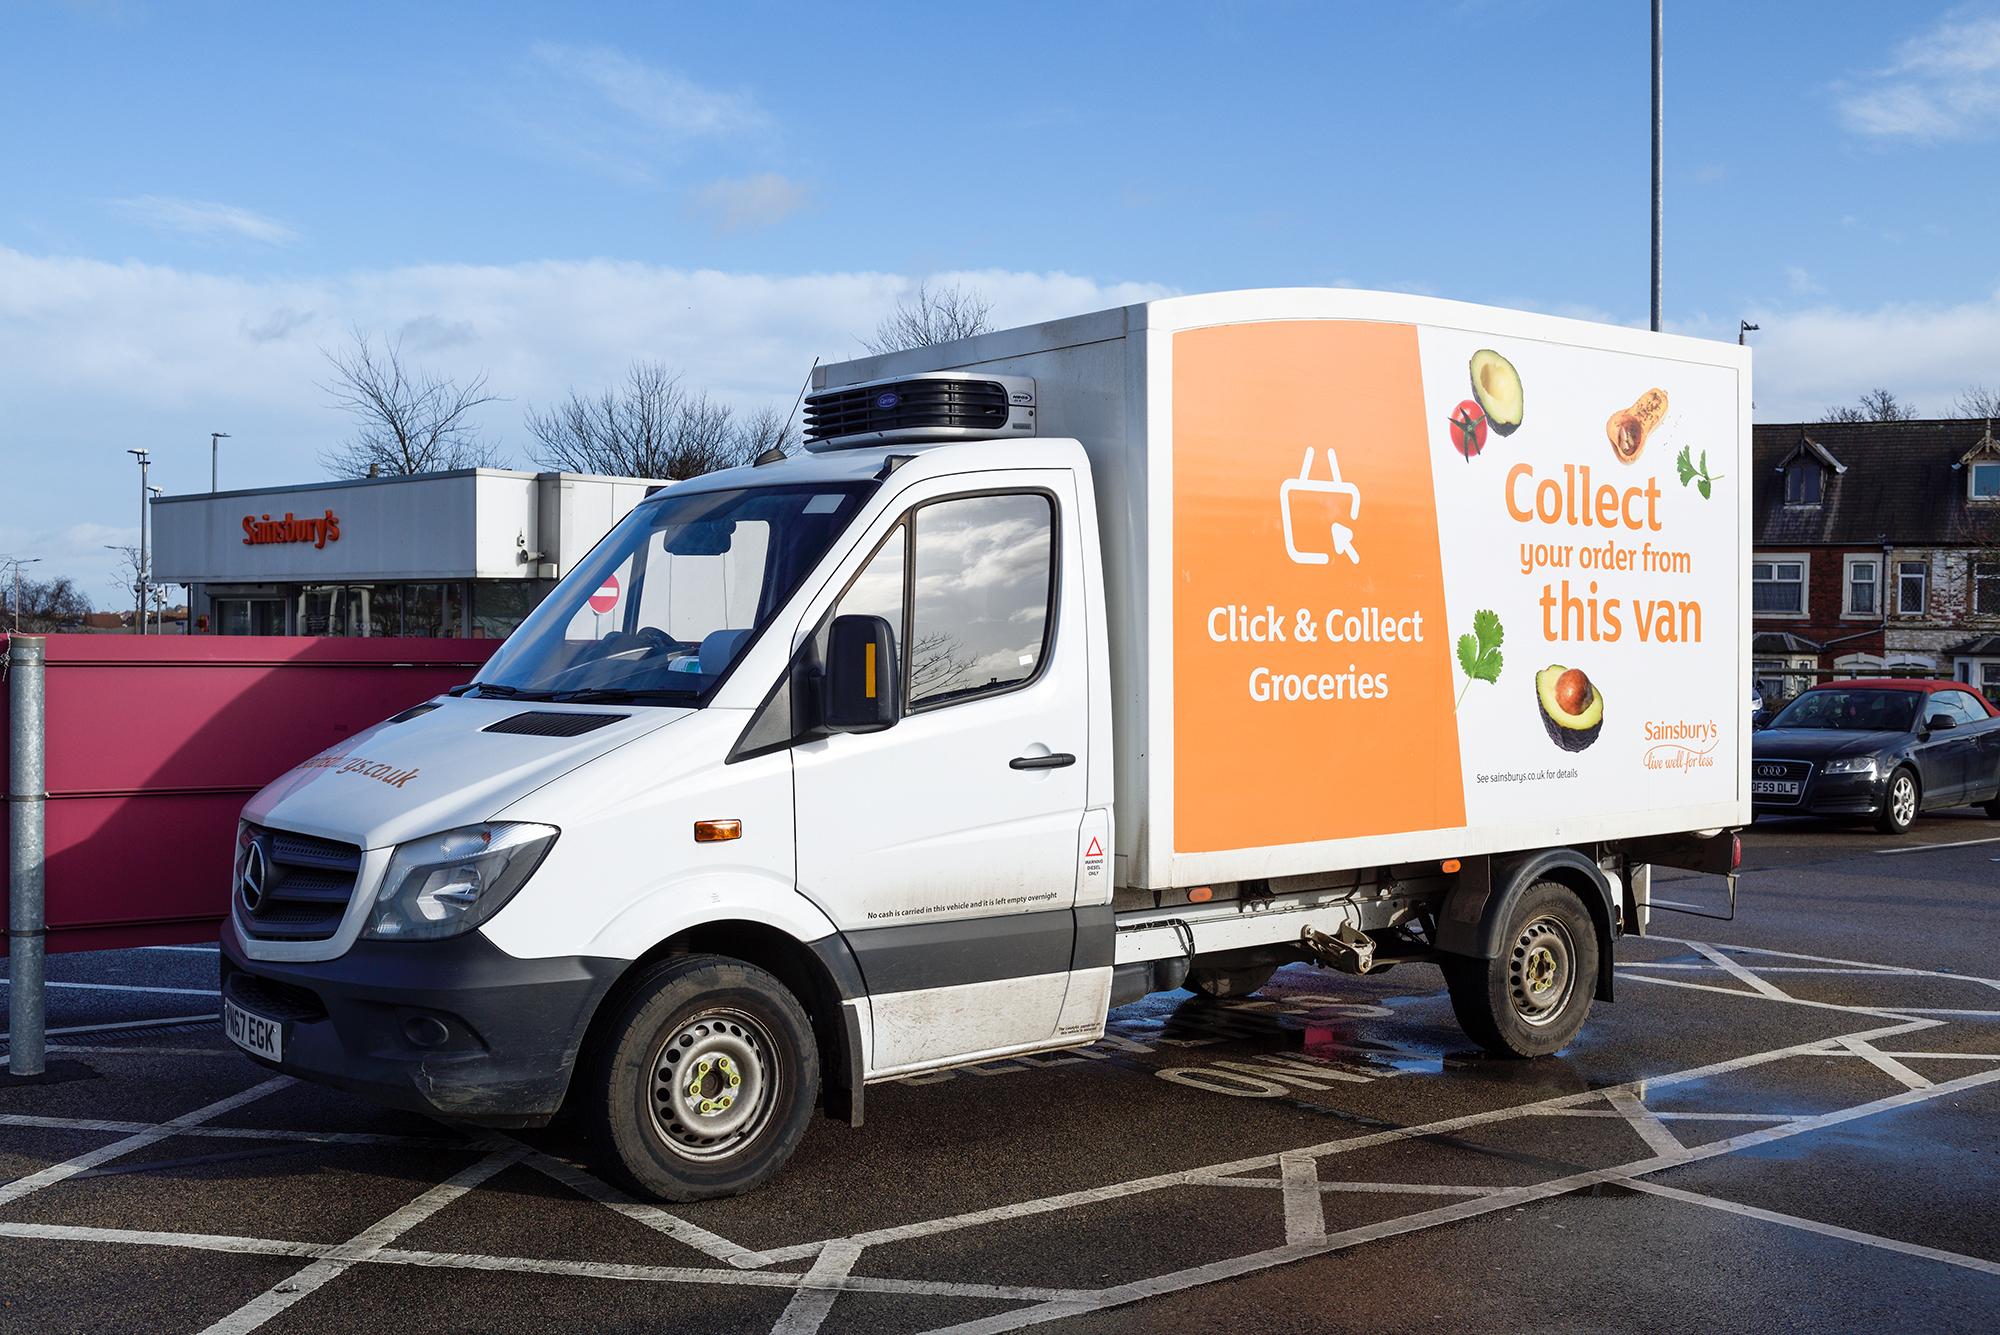 Sainsbury's Click & Collect van. (Image: Ian Francis/Shutterstock)